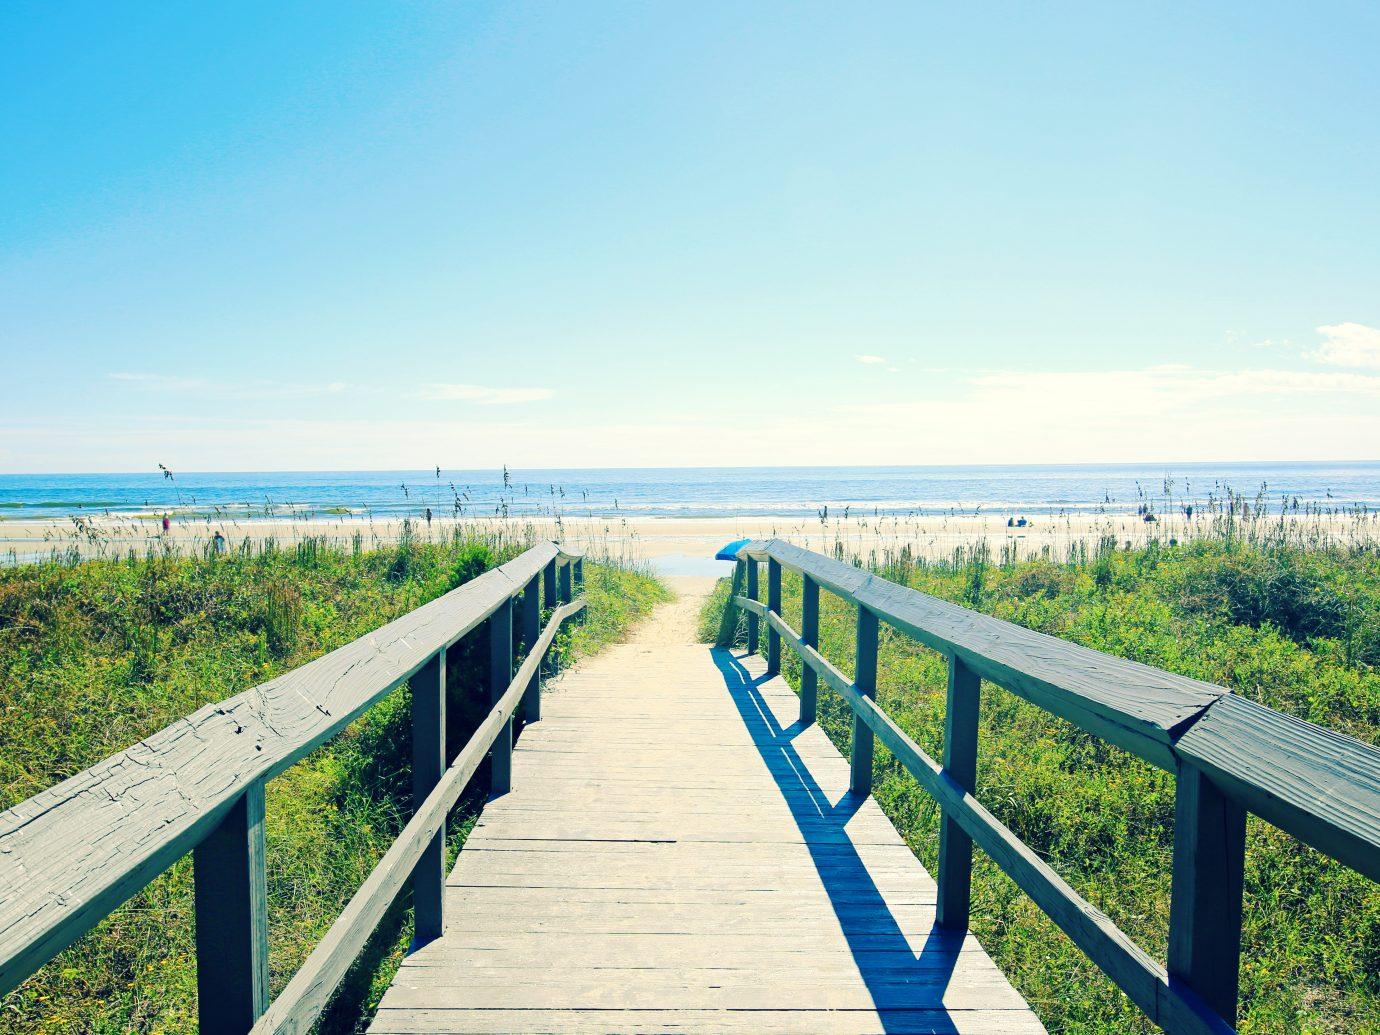 Isle of Palms Beach, South Carolina